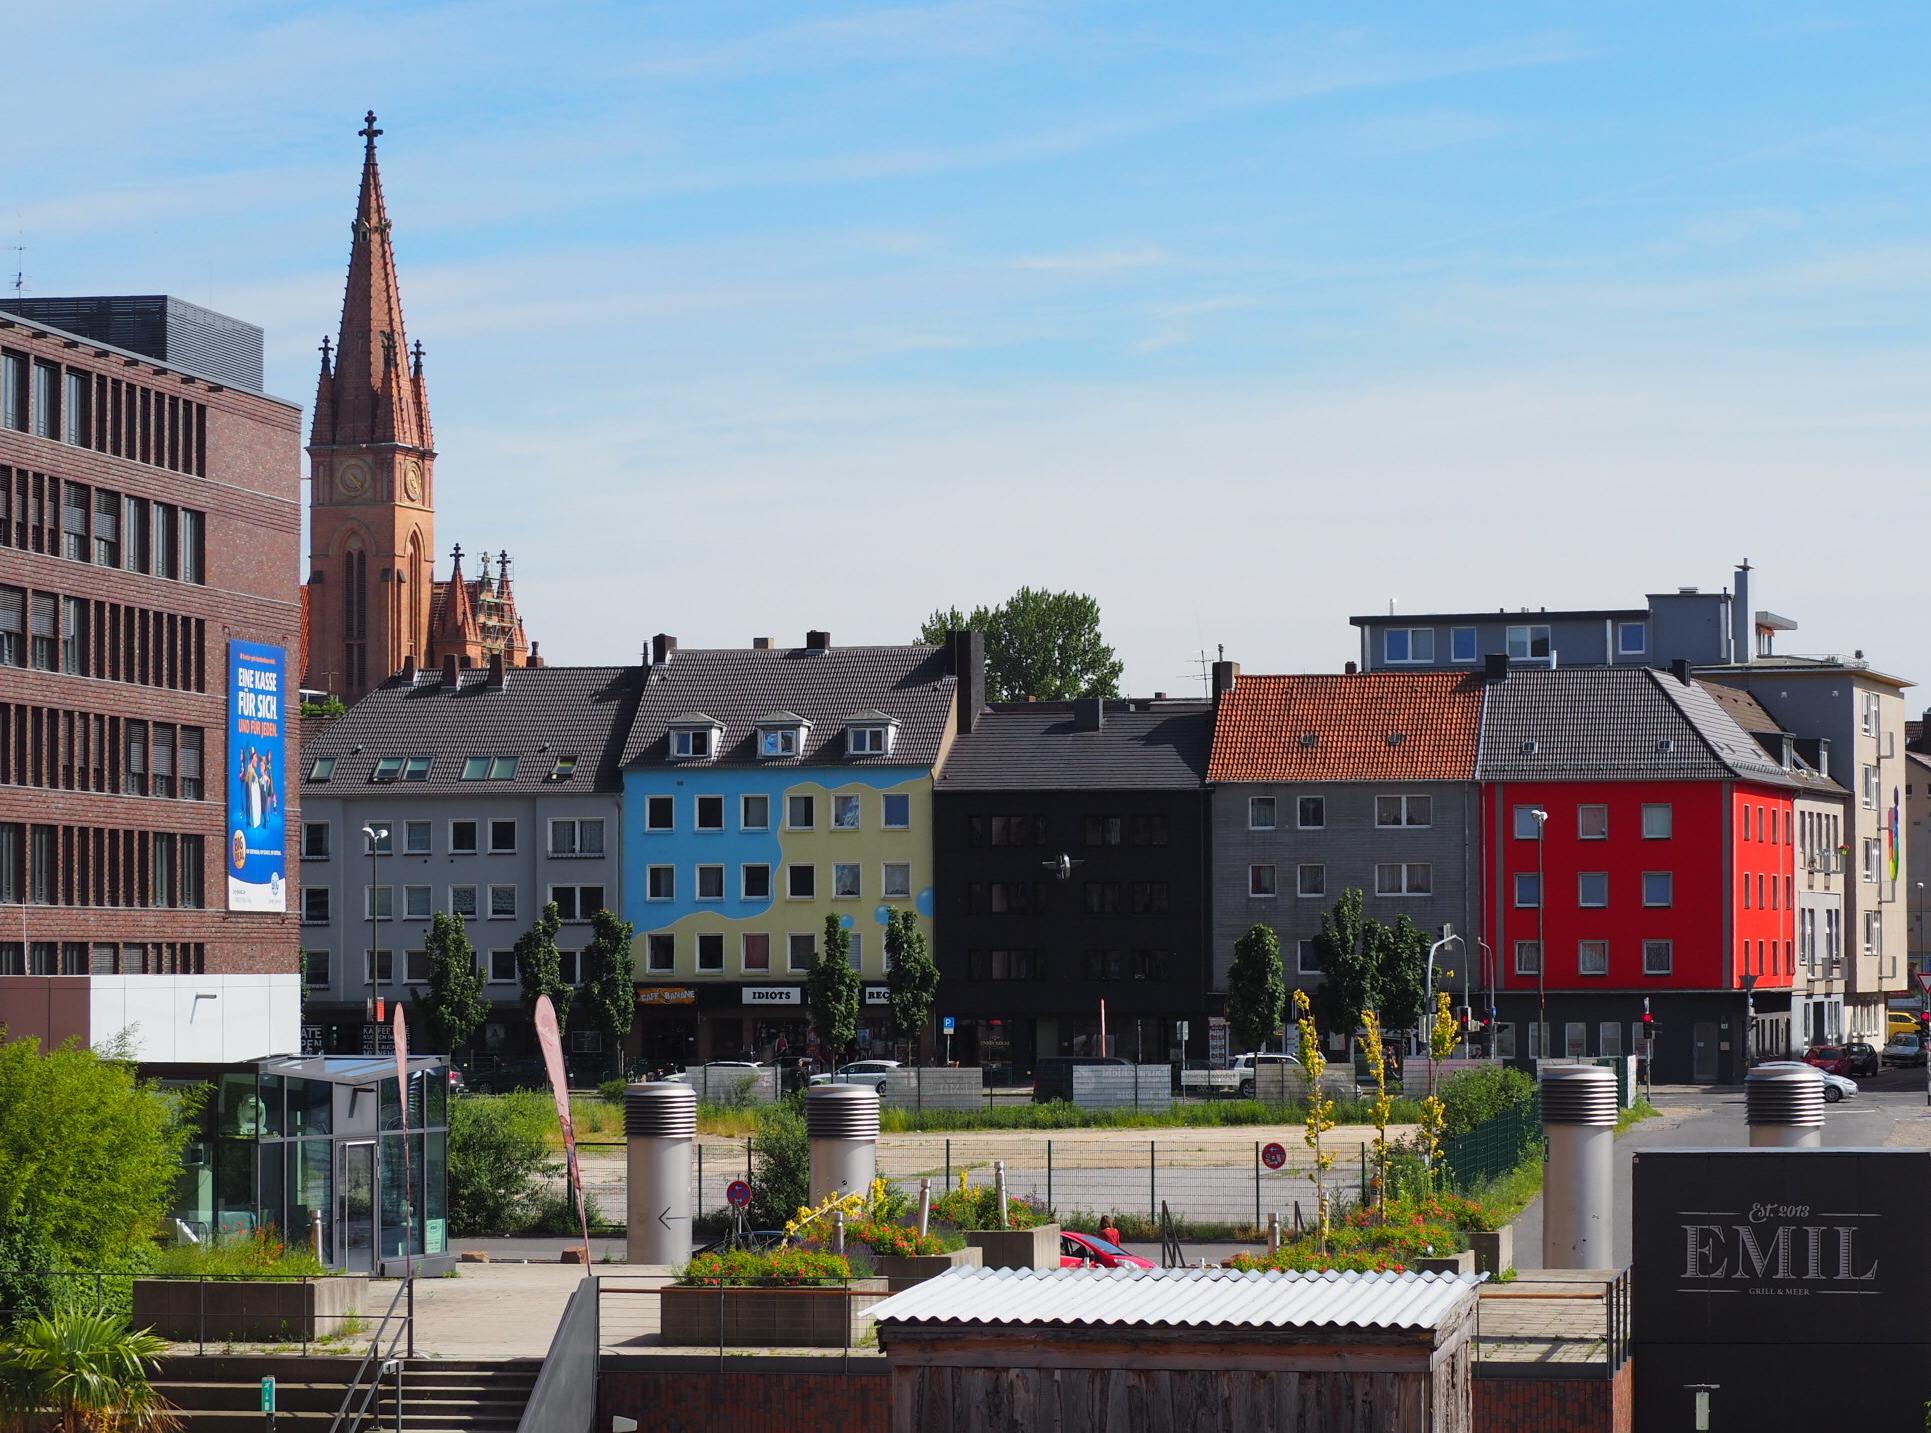 File:Unionviertel Dortmund - Rheinischestraße.jpg - Wikimedia Commons